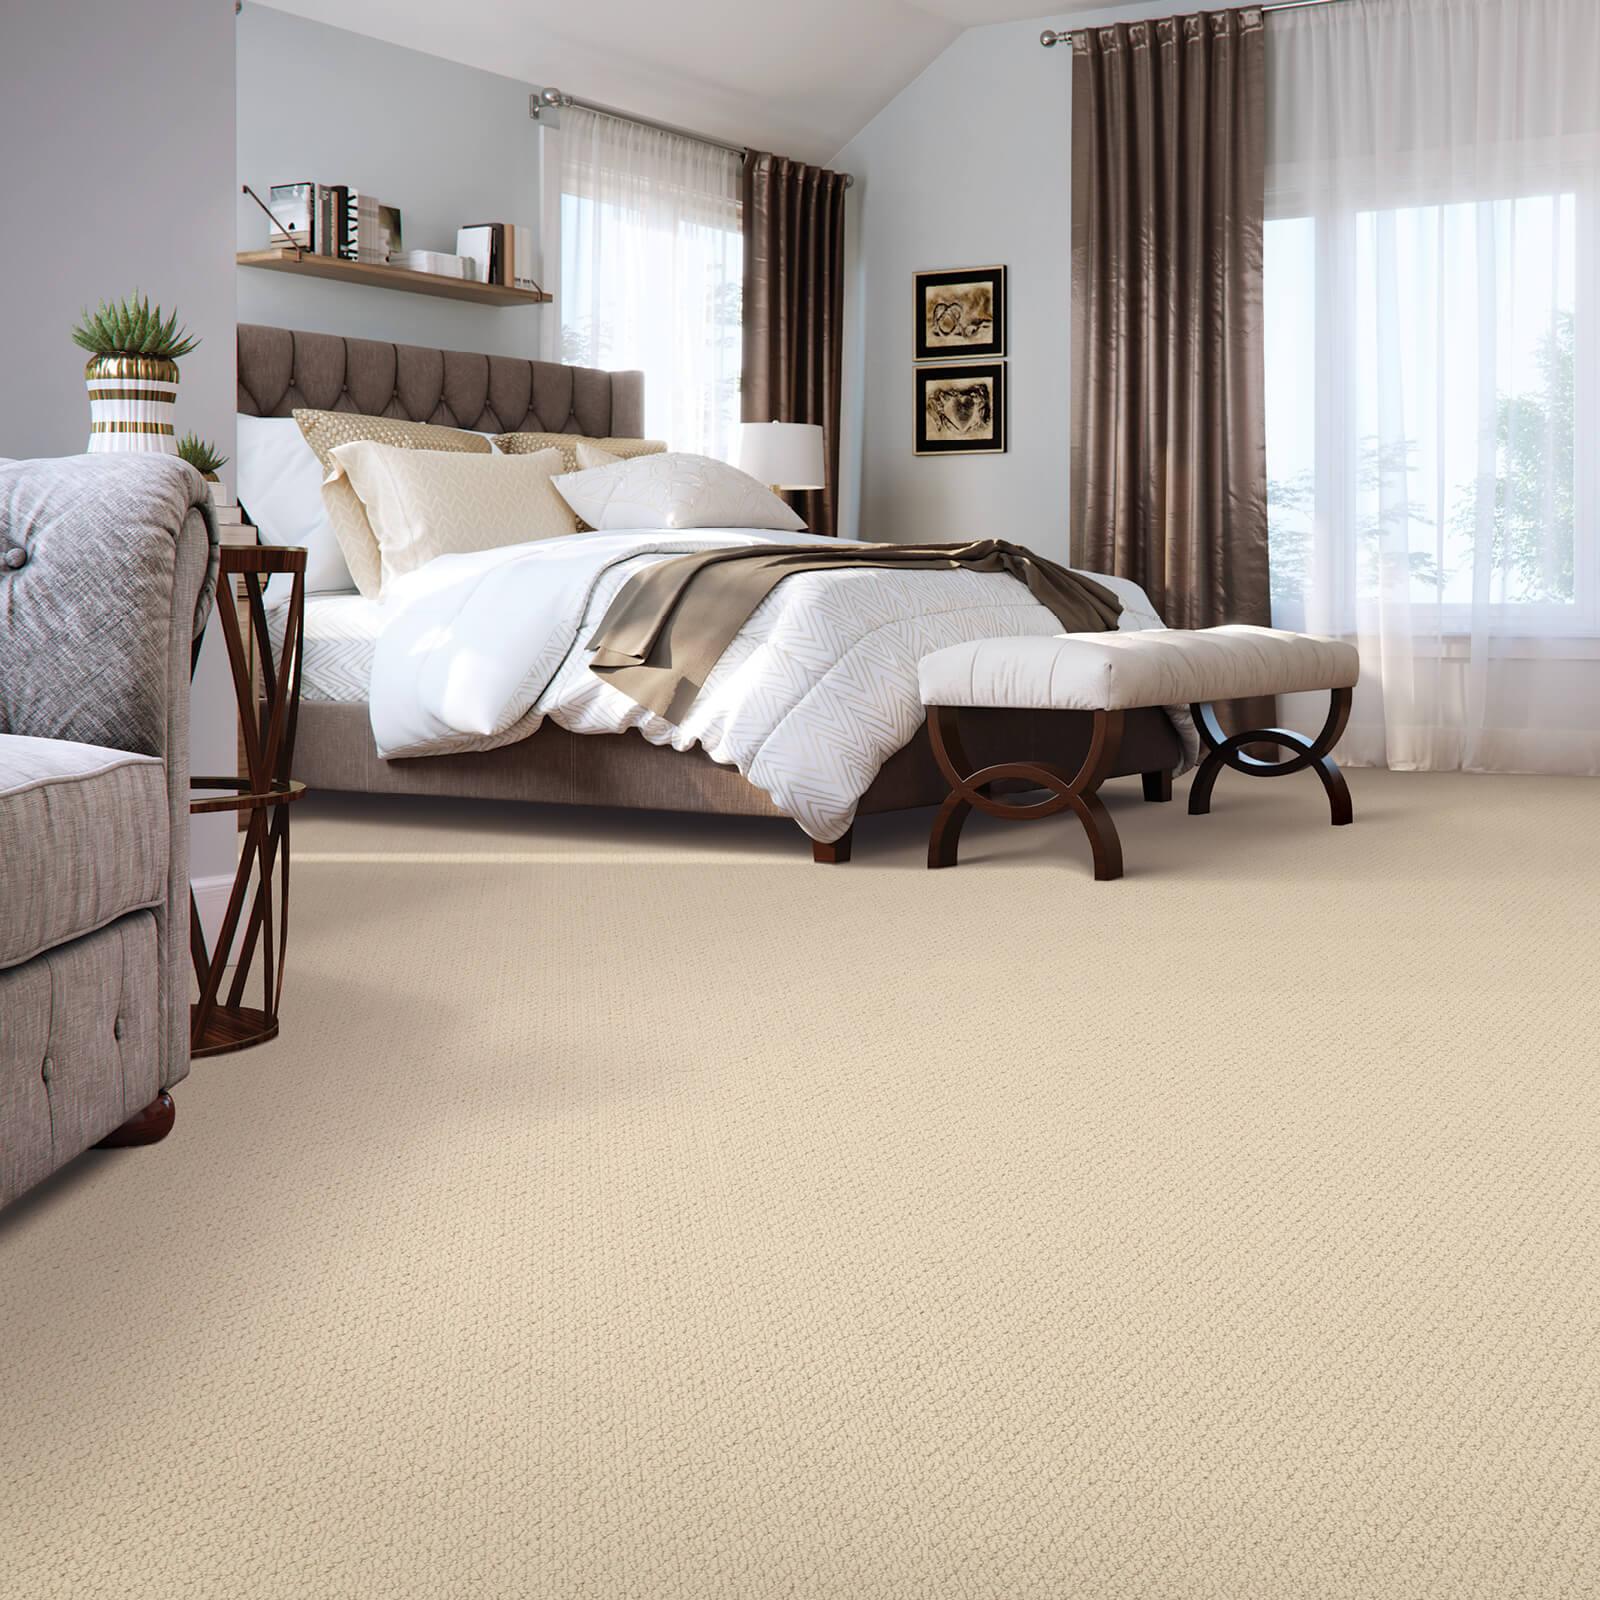 Spacious bedroom carpet flooring | McSwain Carpet & Floors